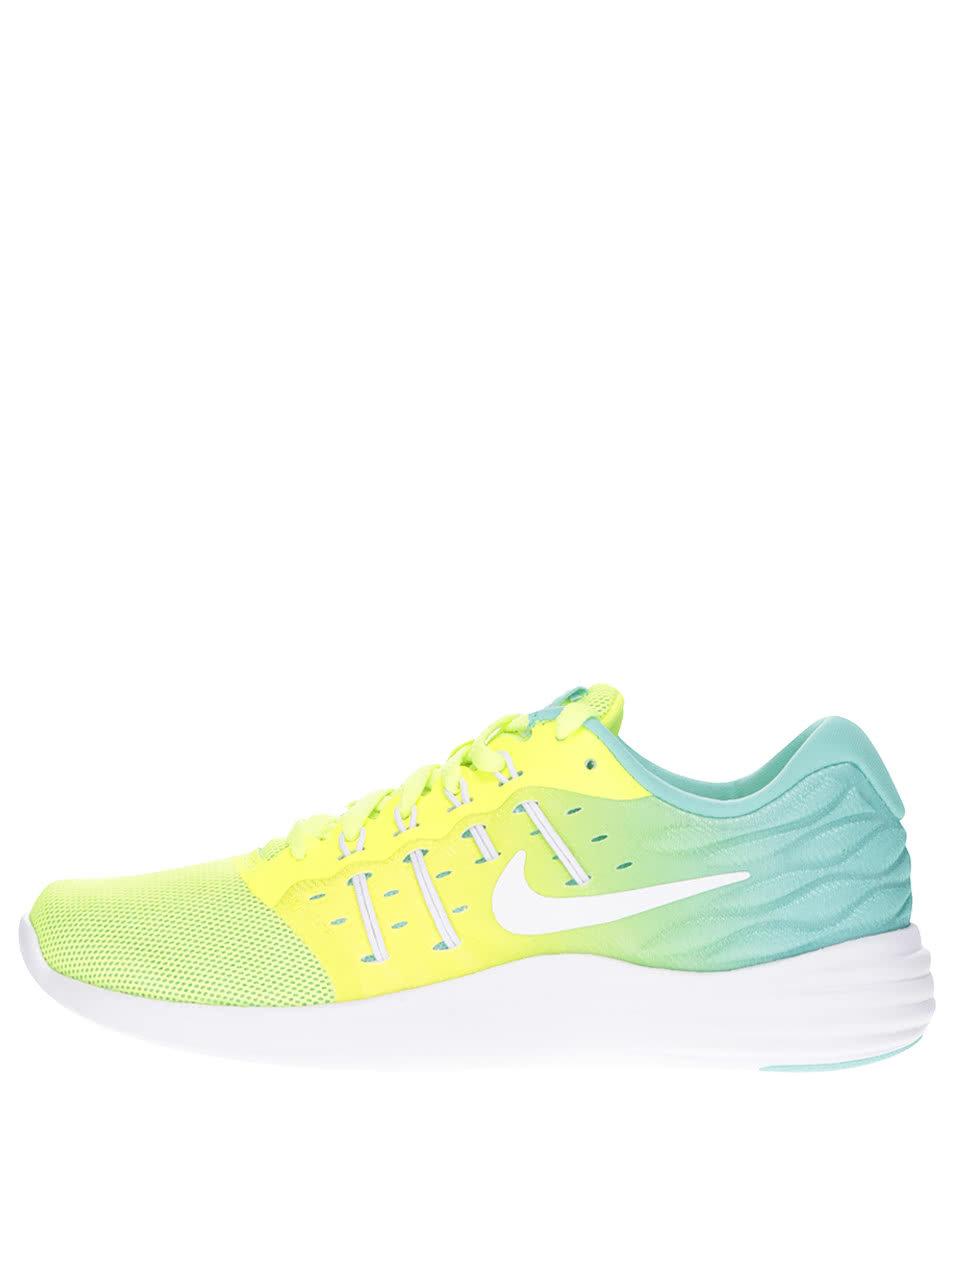 47c105757a5 Žluté neonové dámské tenisky Nike Lunarstelos ...